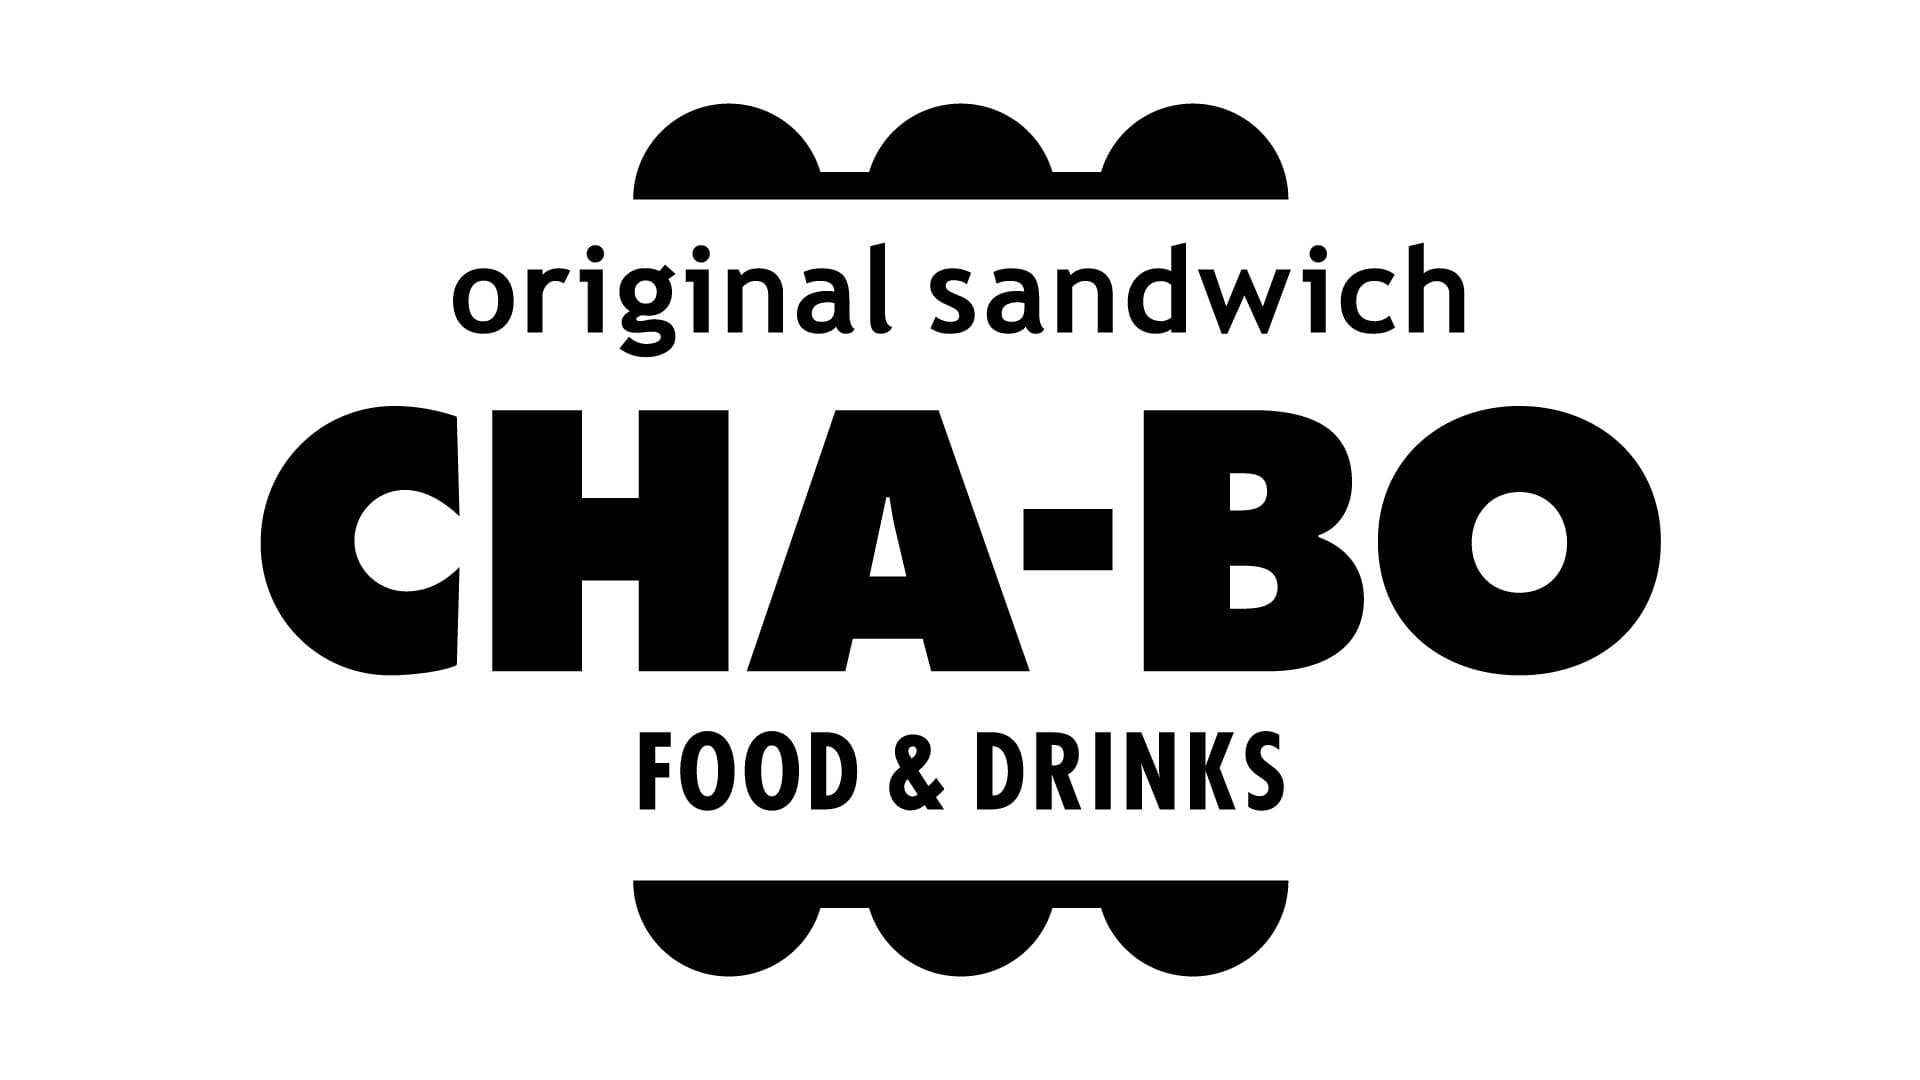 CHA-BO